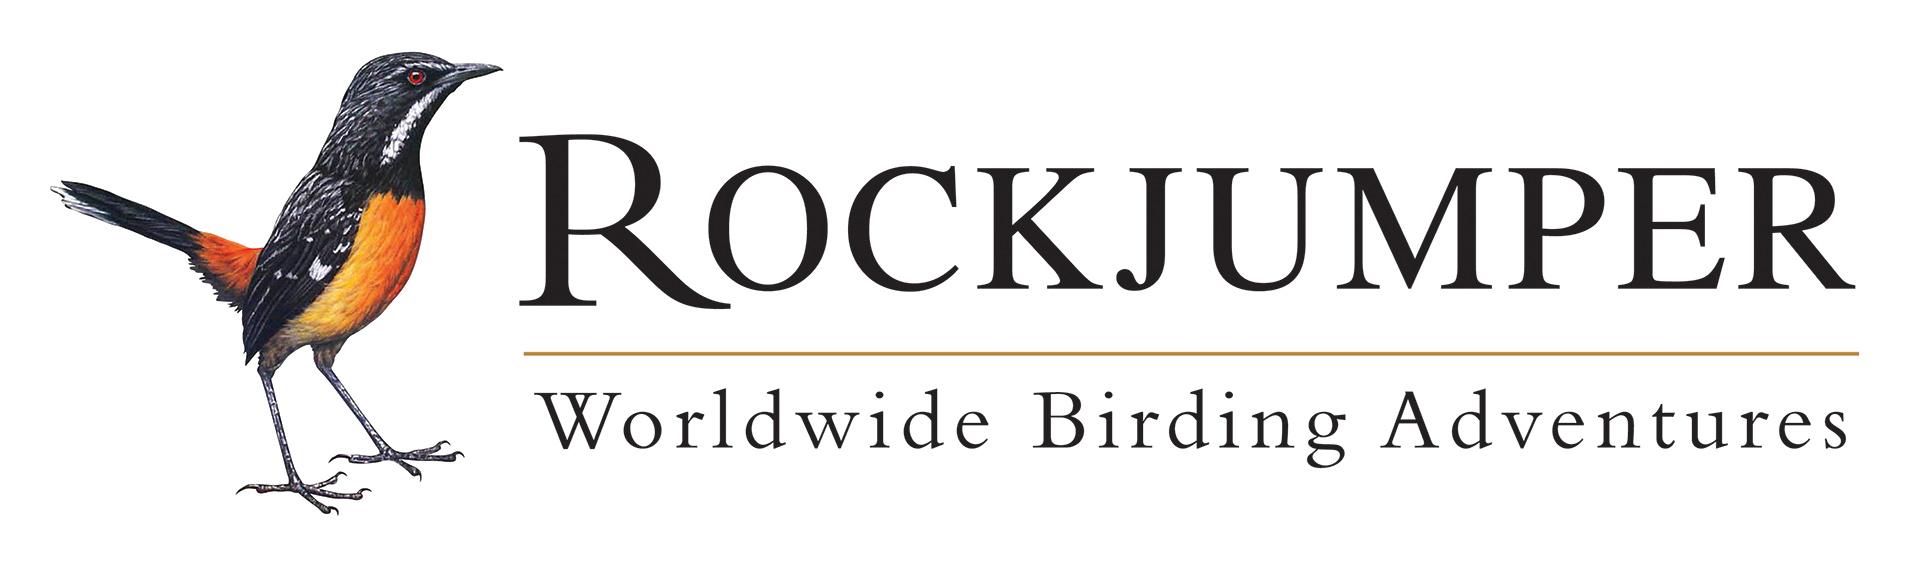 rockjumper-birding-logo-amenities-garlington-estate-equipment-luxury-country-development-hilton-midlands-meander-countryside-kzn